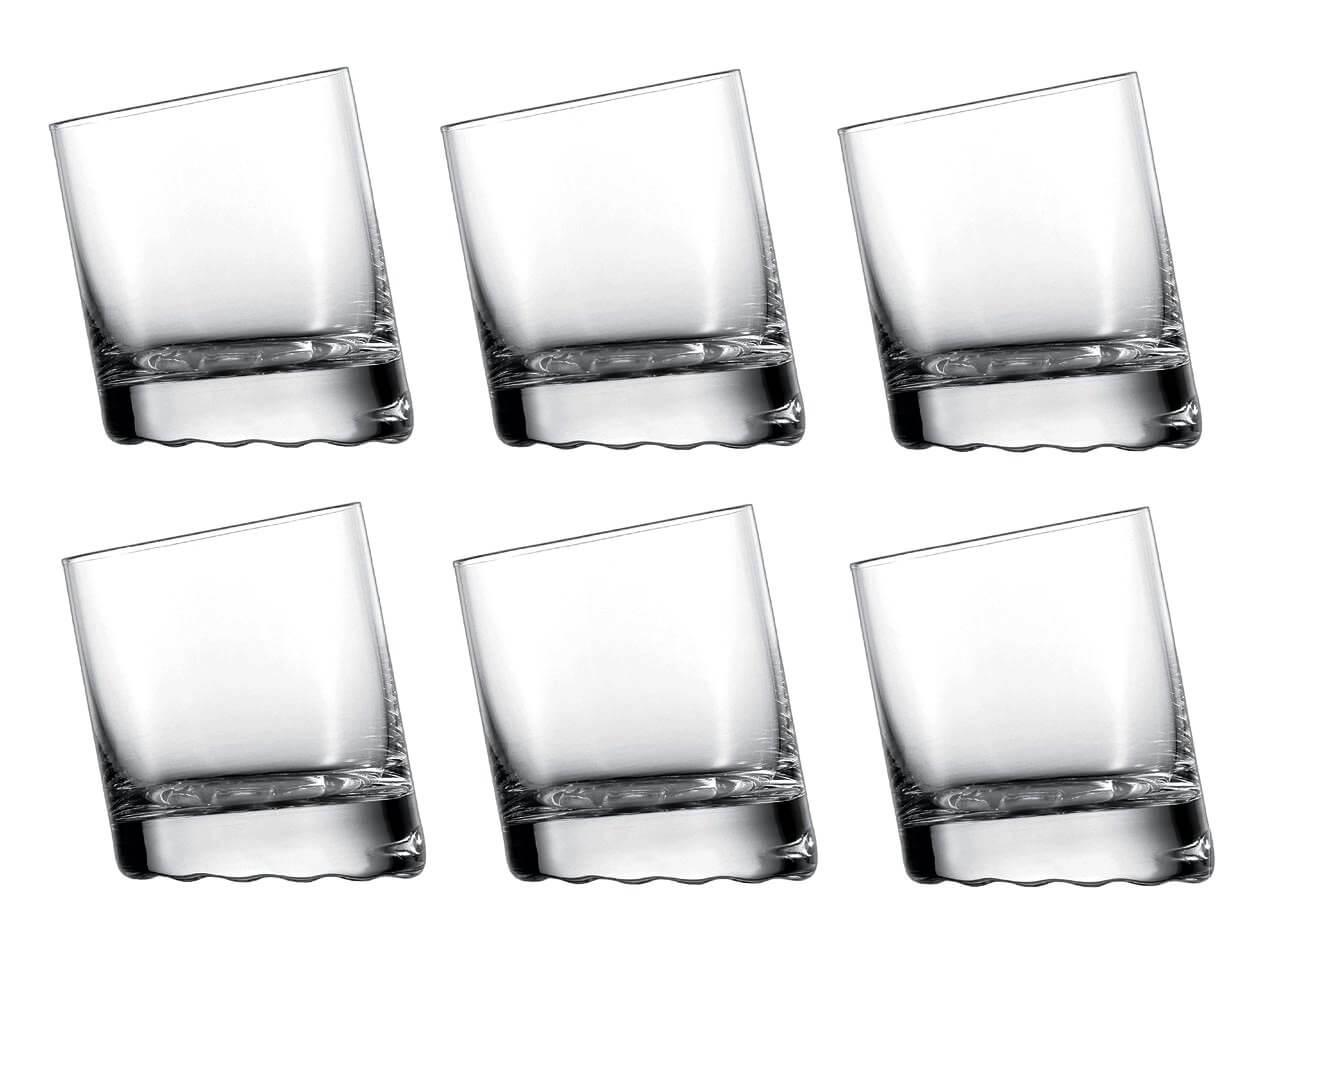 Онлайн каталог PROMENU: Набор стаканов для виски Schott Zwiesel 10 Grad, объем 0,325 л, 6 шт.                               145063_6шт